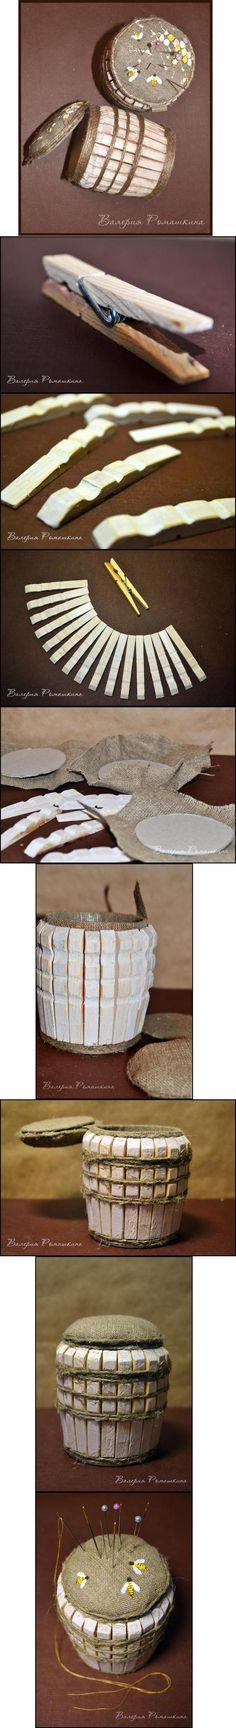 DIY Clothespin Barrel Pincushion